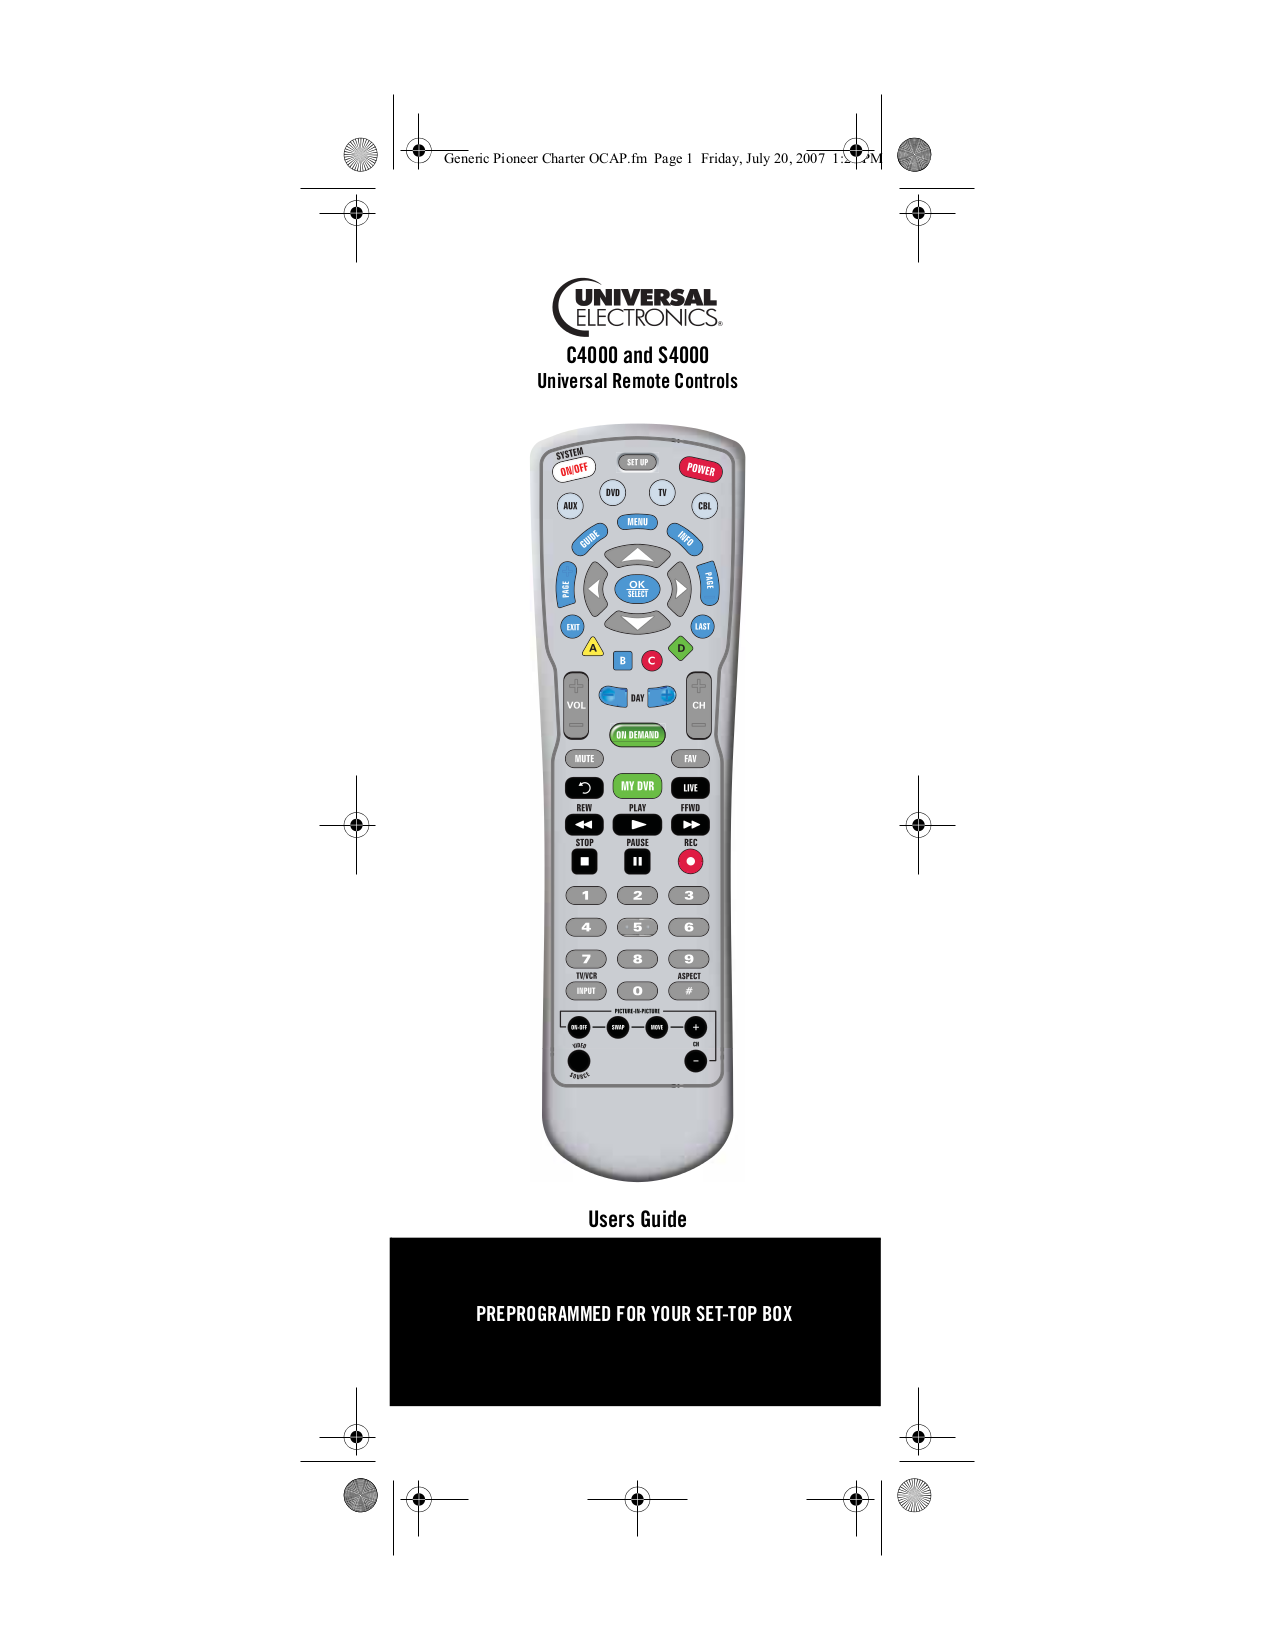 pdf manual for rca remote control rcu410 rh umlib com RCA Television Owner Manual rca remote rcu410wms manual